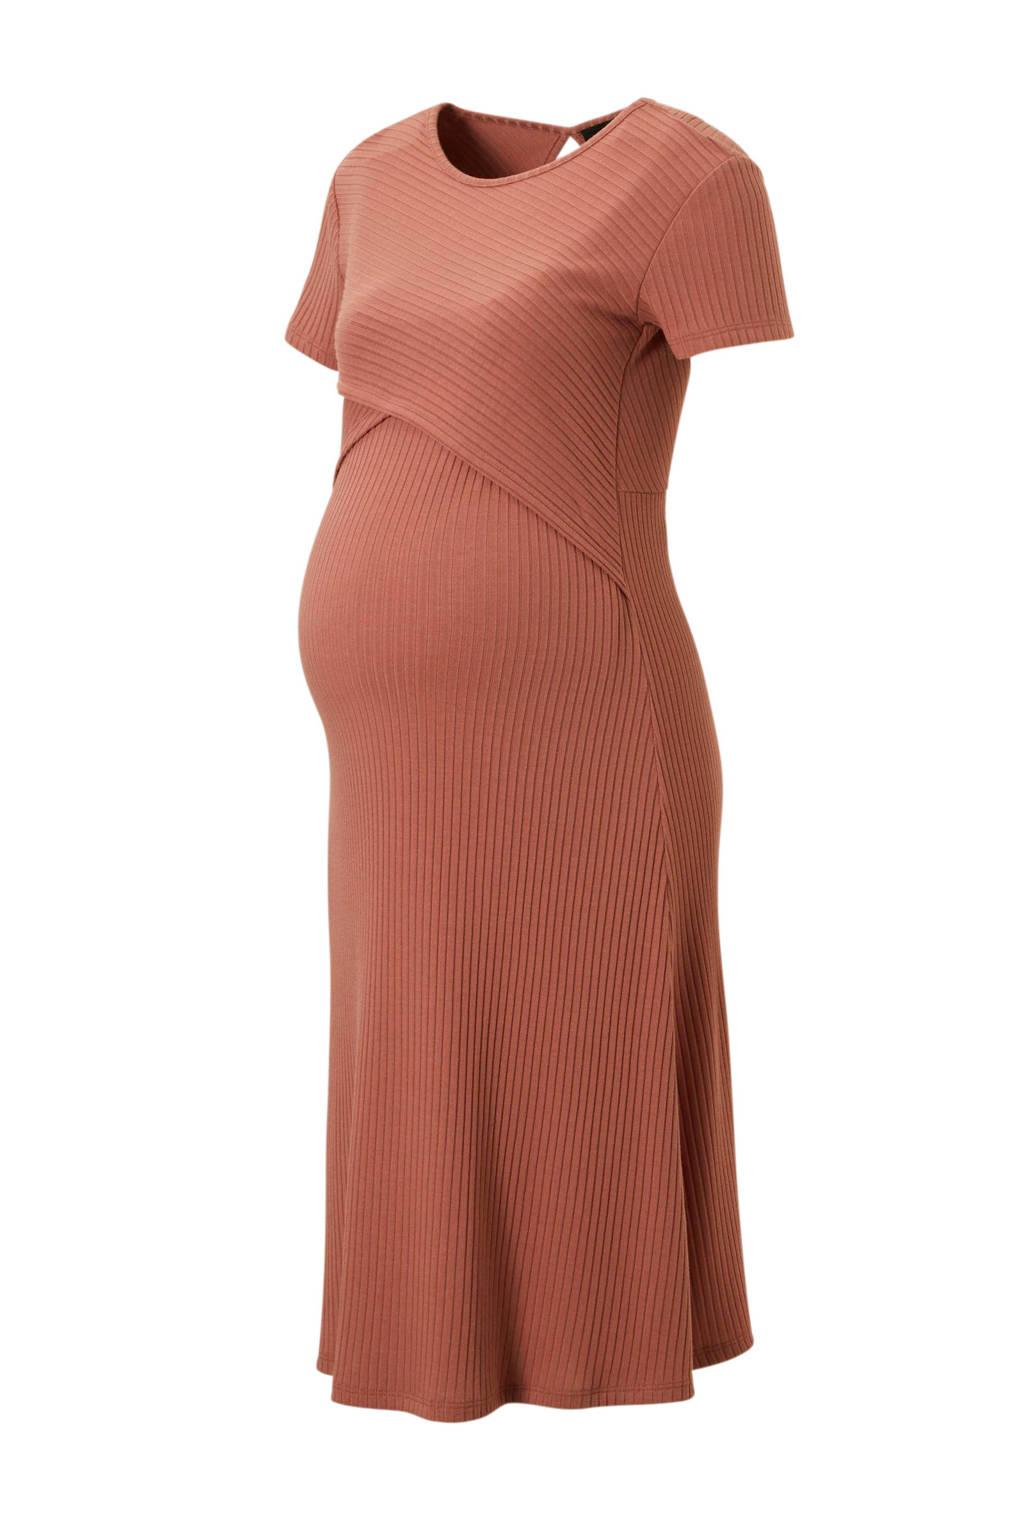 Supermom zwangerschap + voeding jurk roze, Oudroze